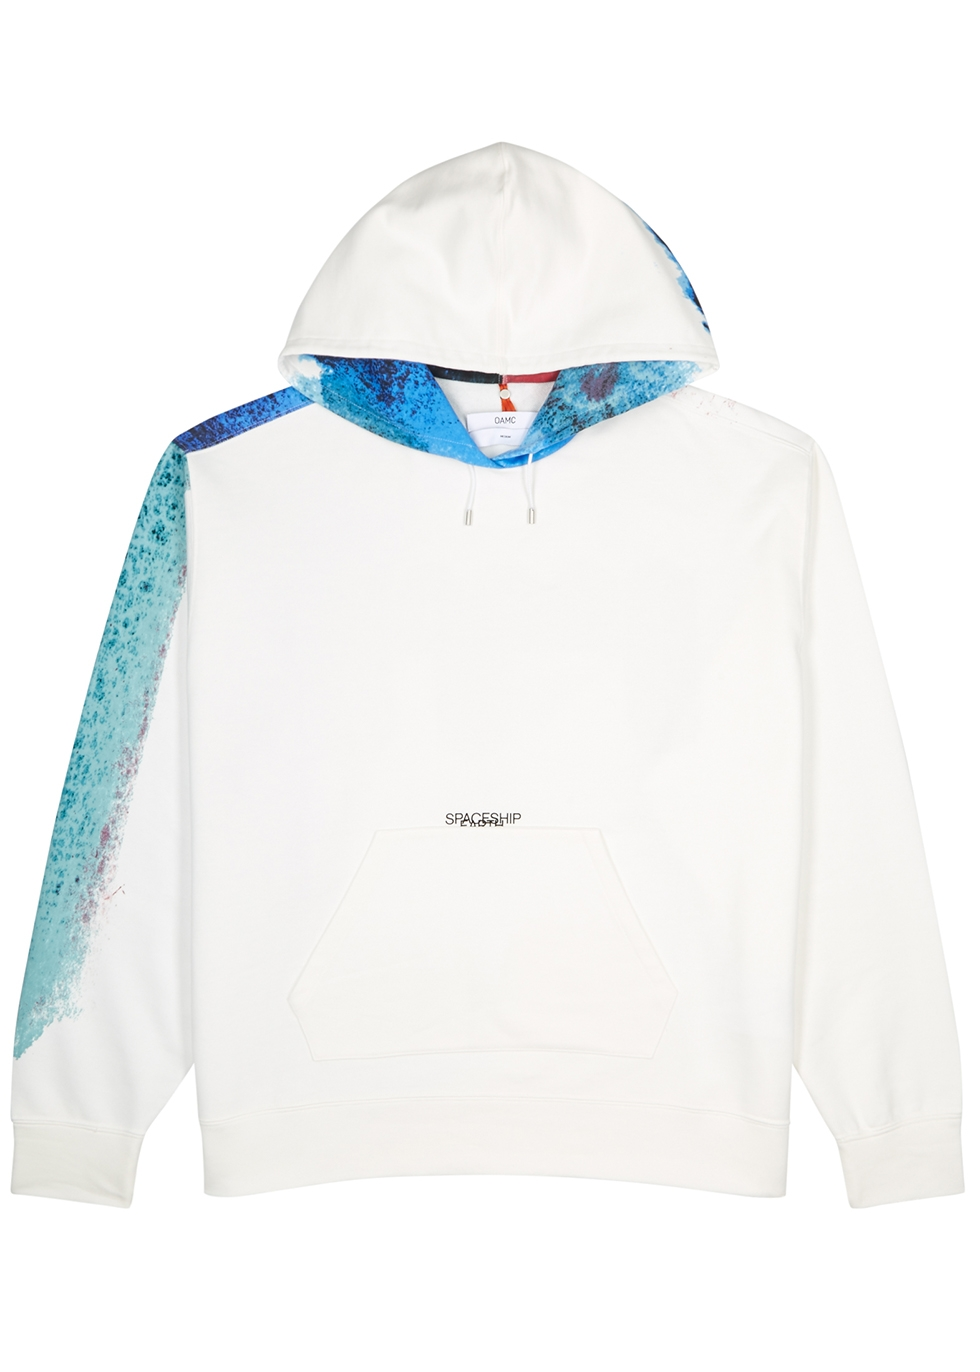 Watercolour white cotton sweatshirt - OAMC